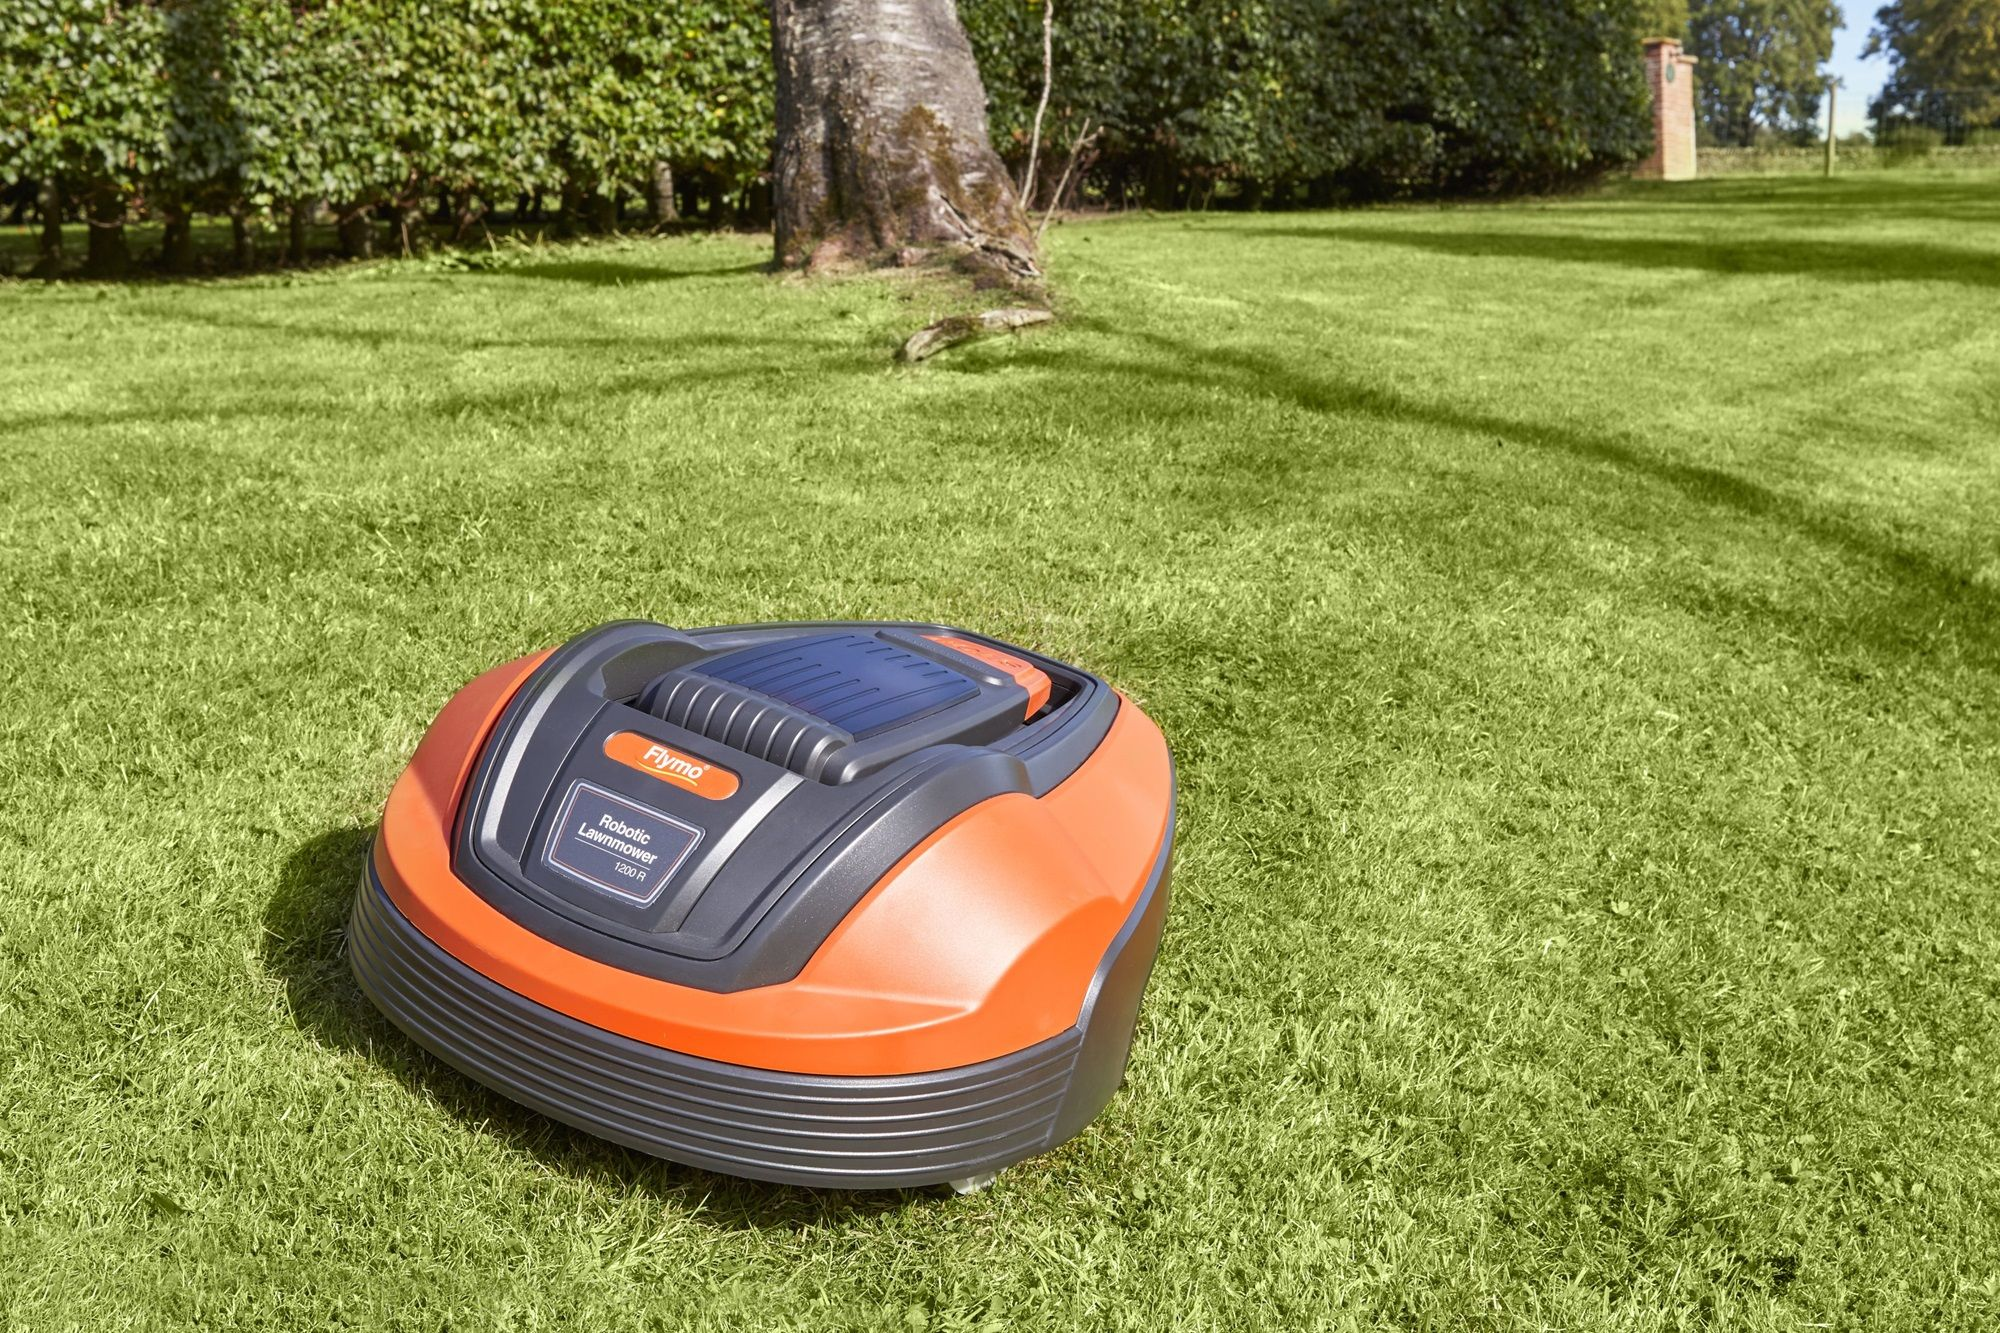 Flymo Uk Robotic Lawn Mower Lawn Mower Lawn Mowers